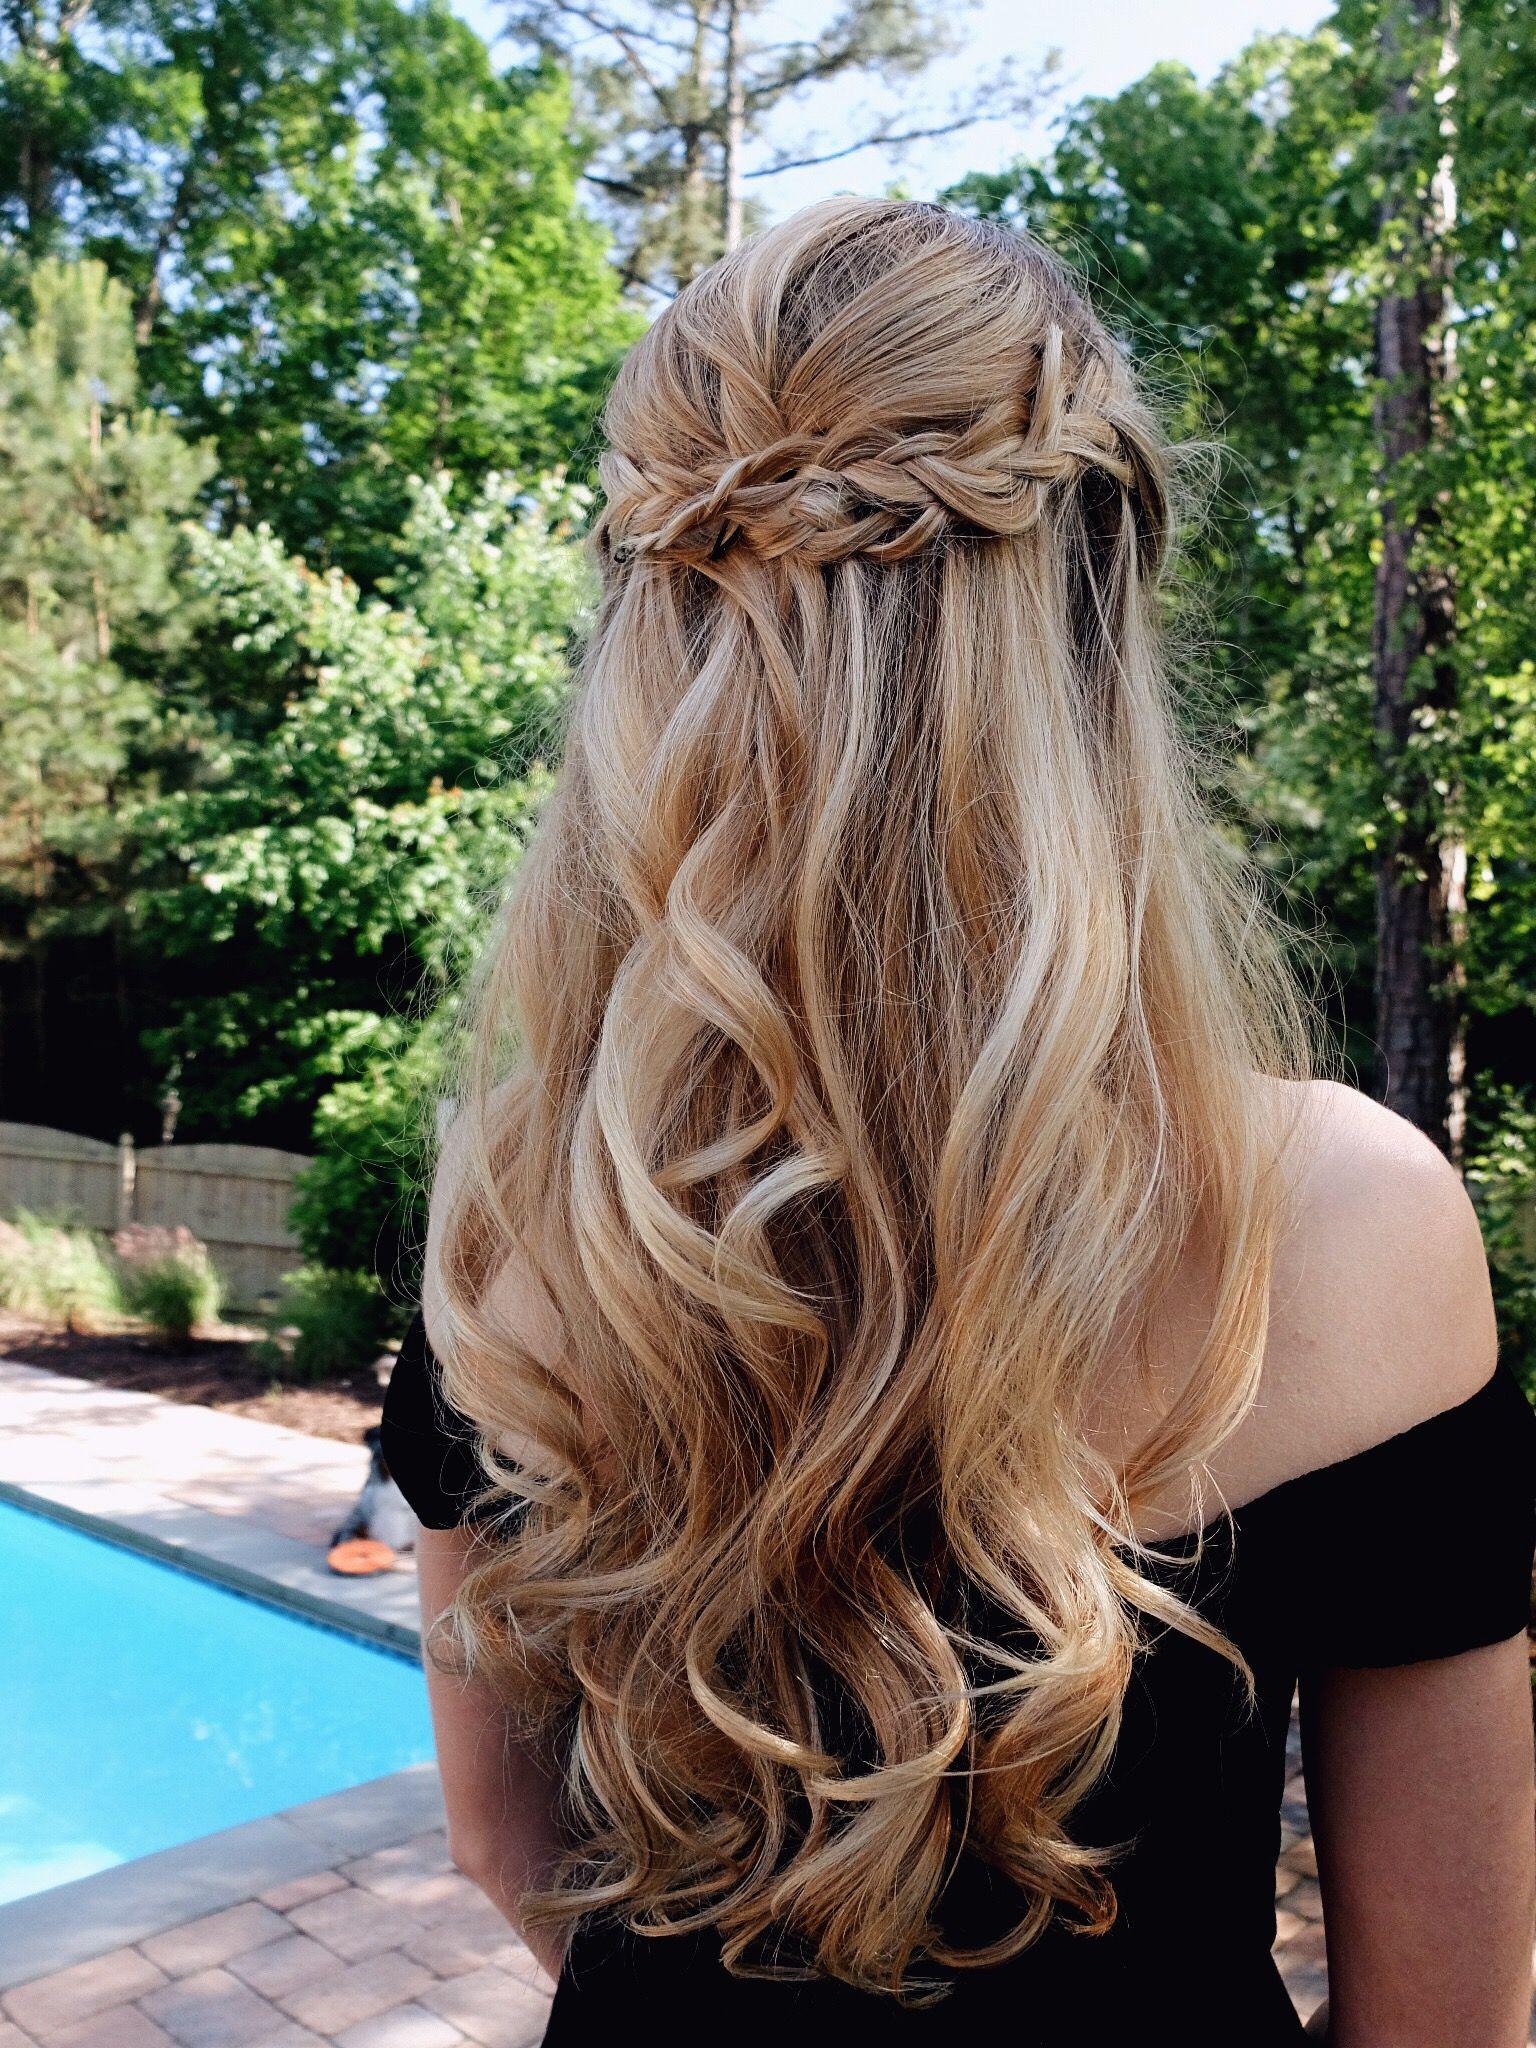 Beautiful prom hair prom promhair braid curls peinados